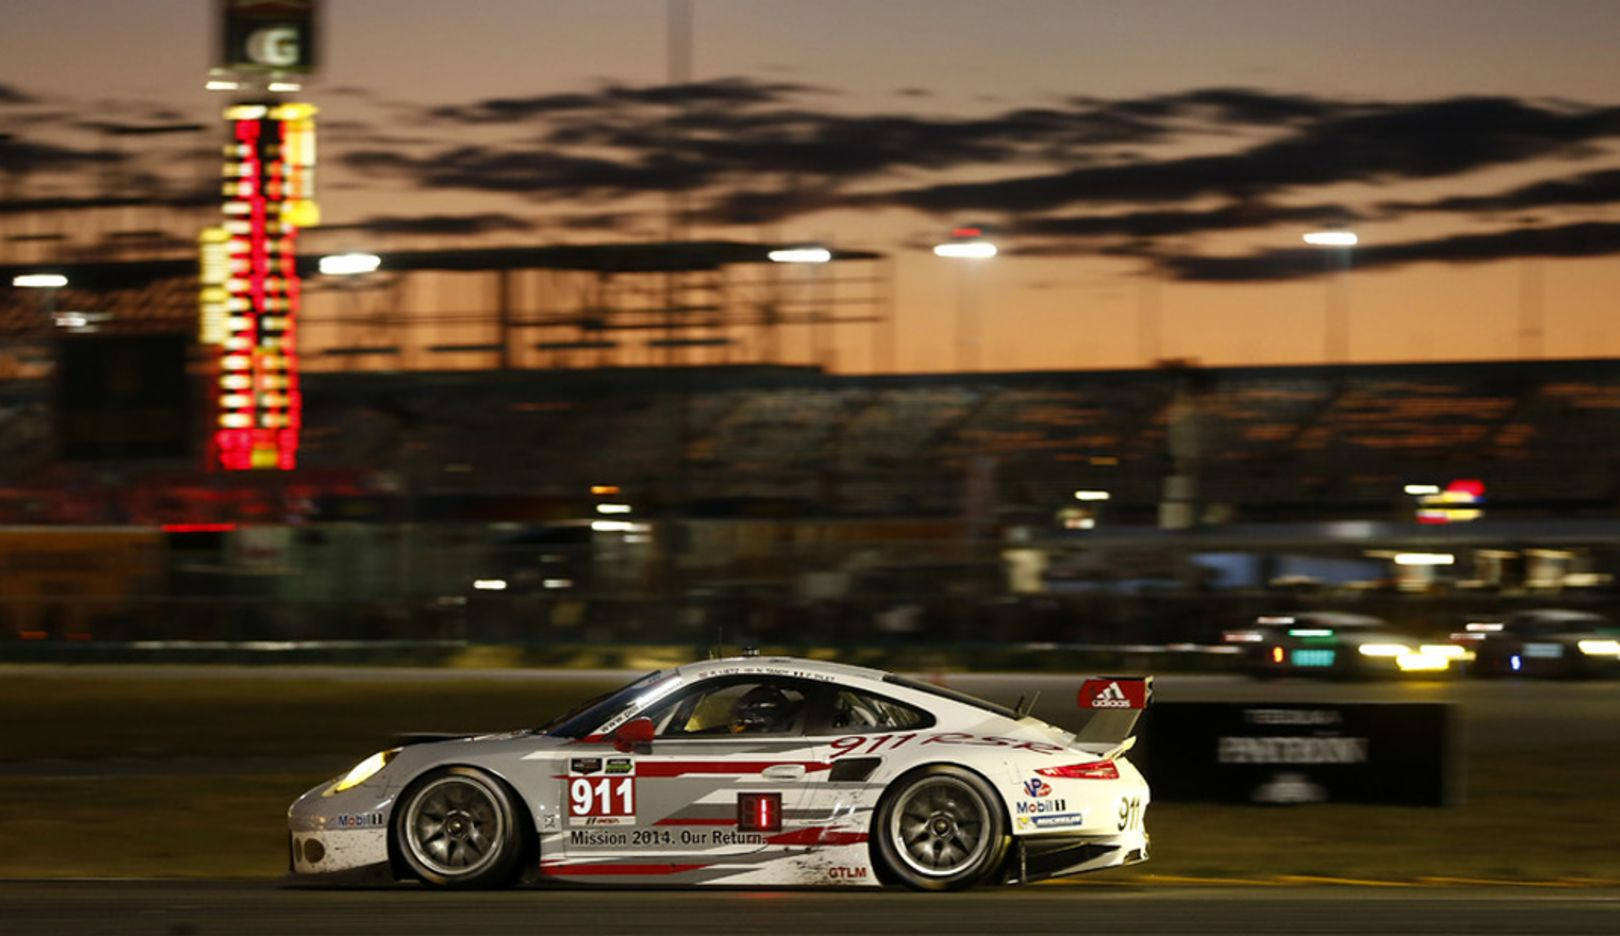 911 RSR, Tudor United Sports Car Championship, 2014, Porsche AG